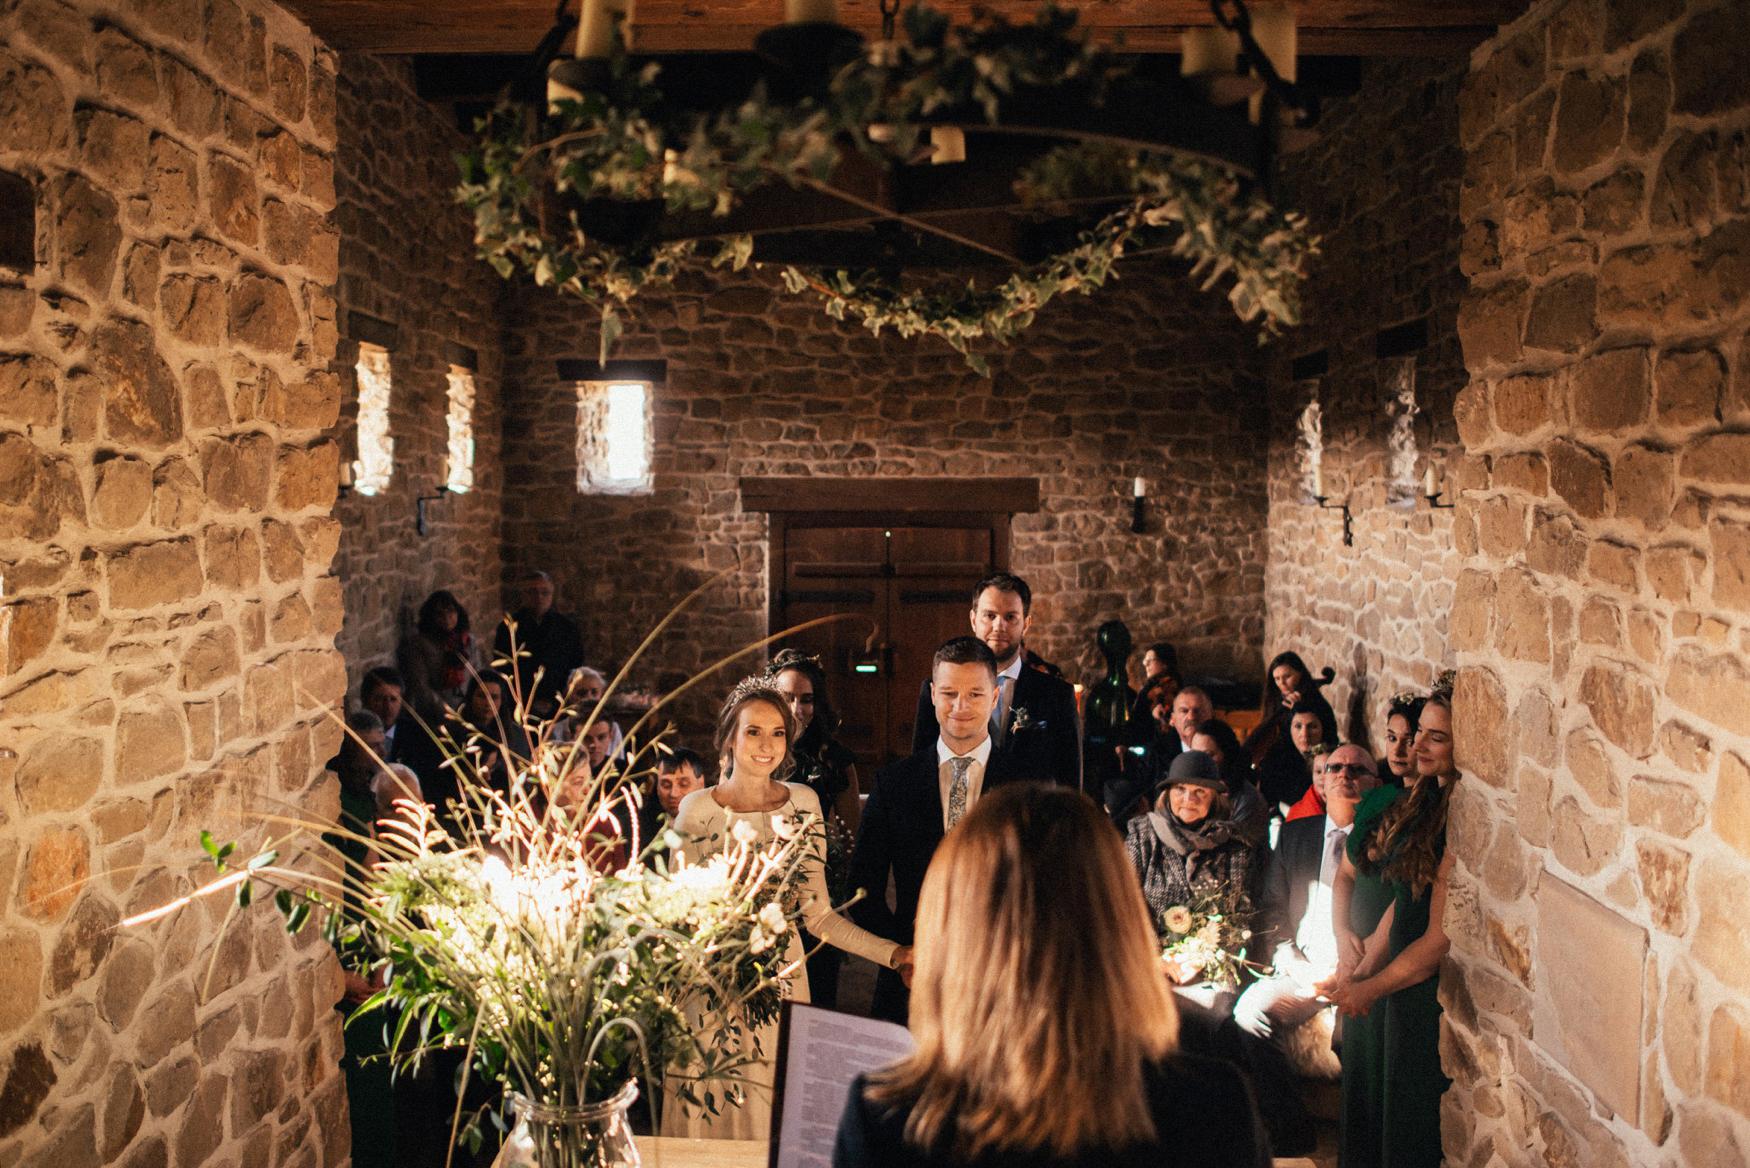 2 prague wedding photographer - boho svatba zikmundov015.jpg